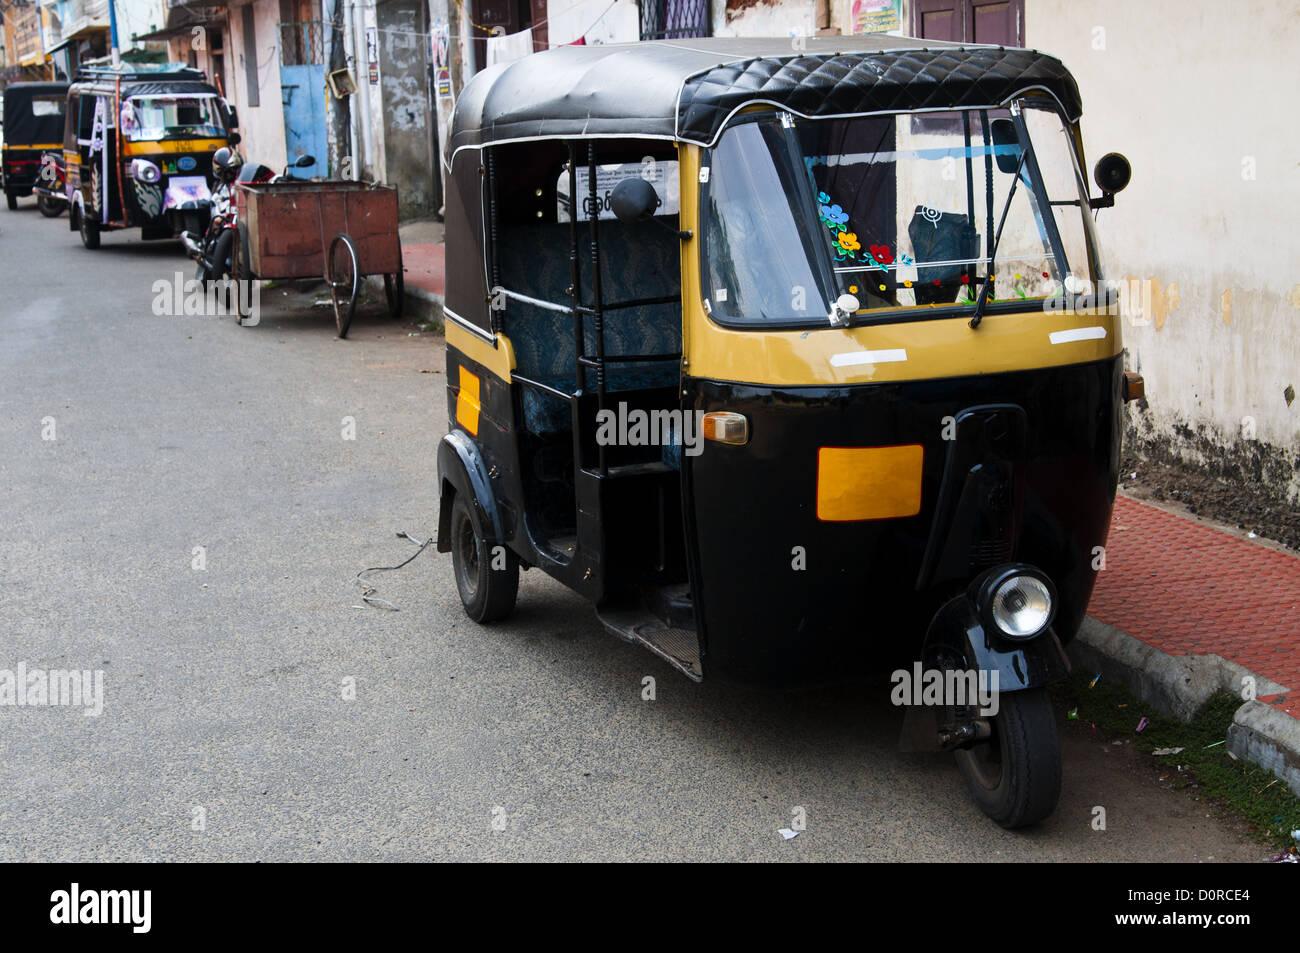 Tut-tuk - Auto rickshaw taxi in Kerala - Stock Image